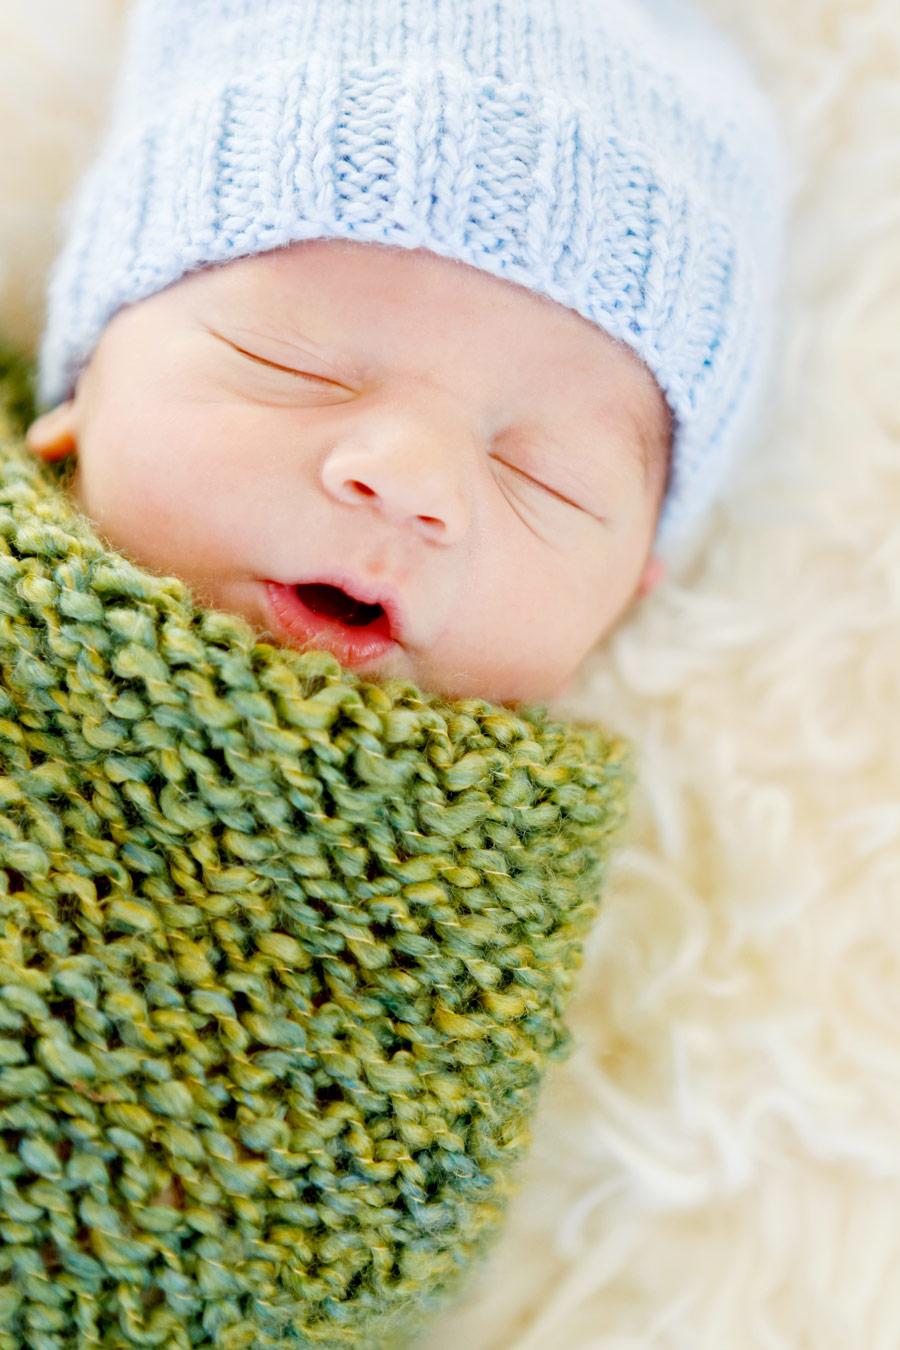 newborn-baby-portrait-family-session-ruthie-hauge-photography-st-charles-geneva-batavia.jpg